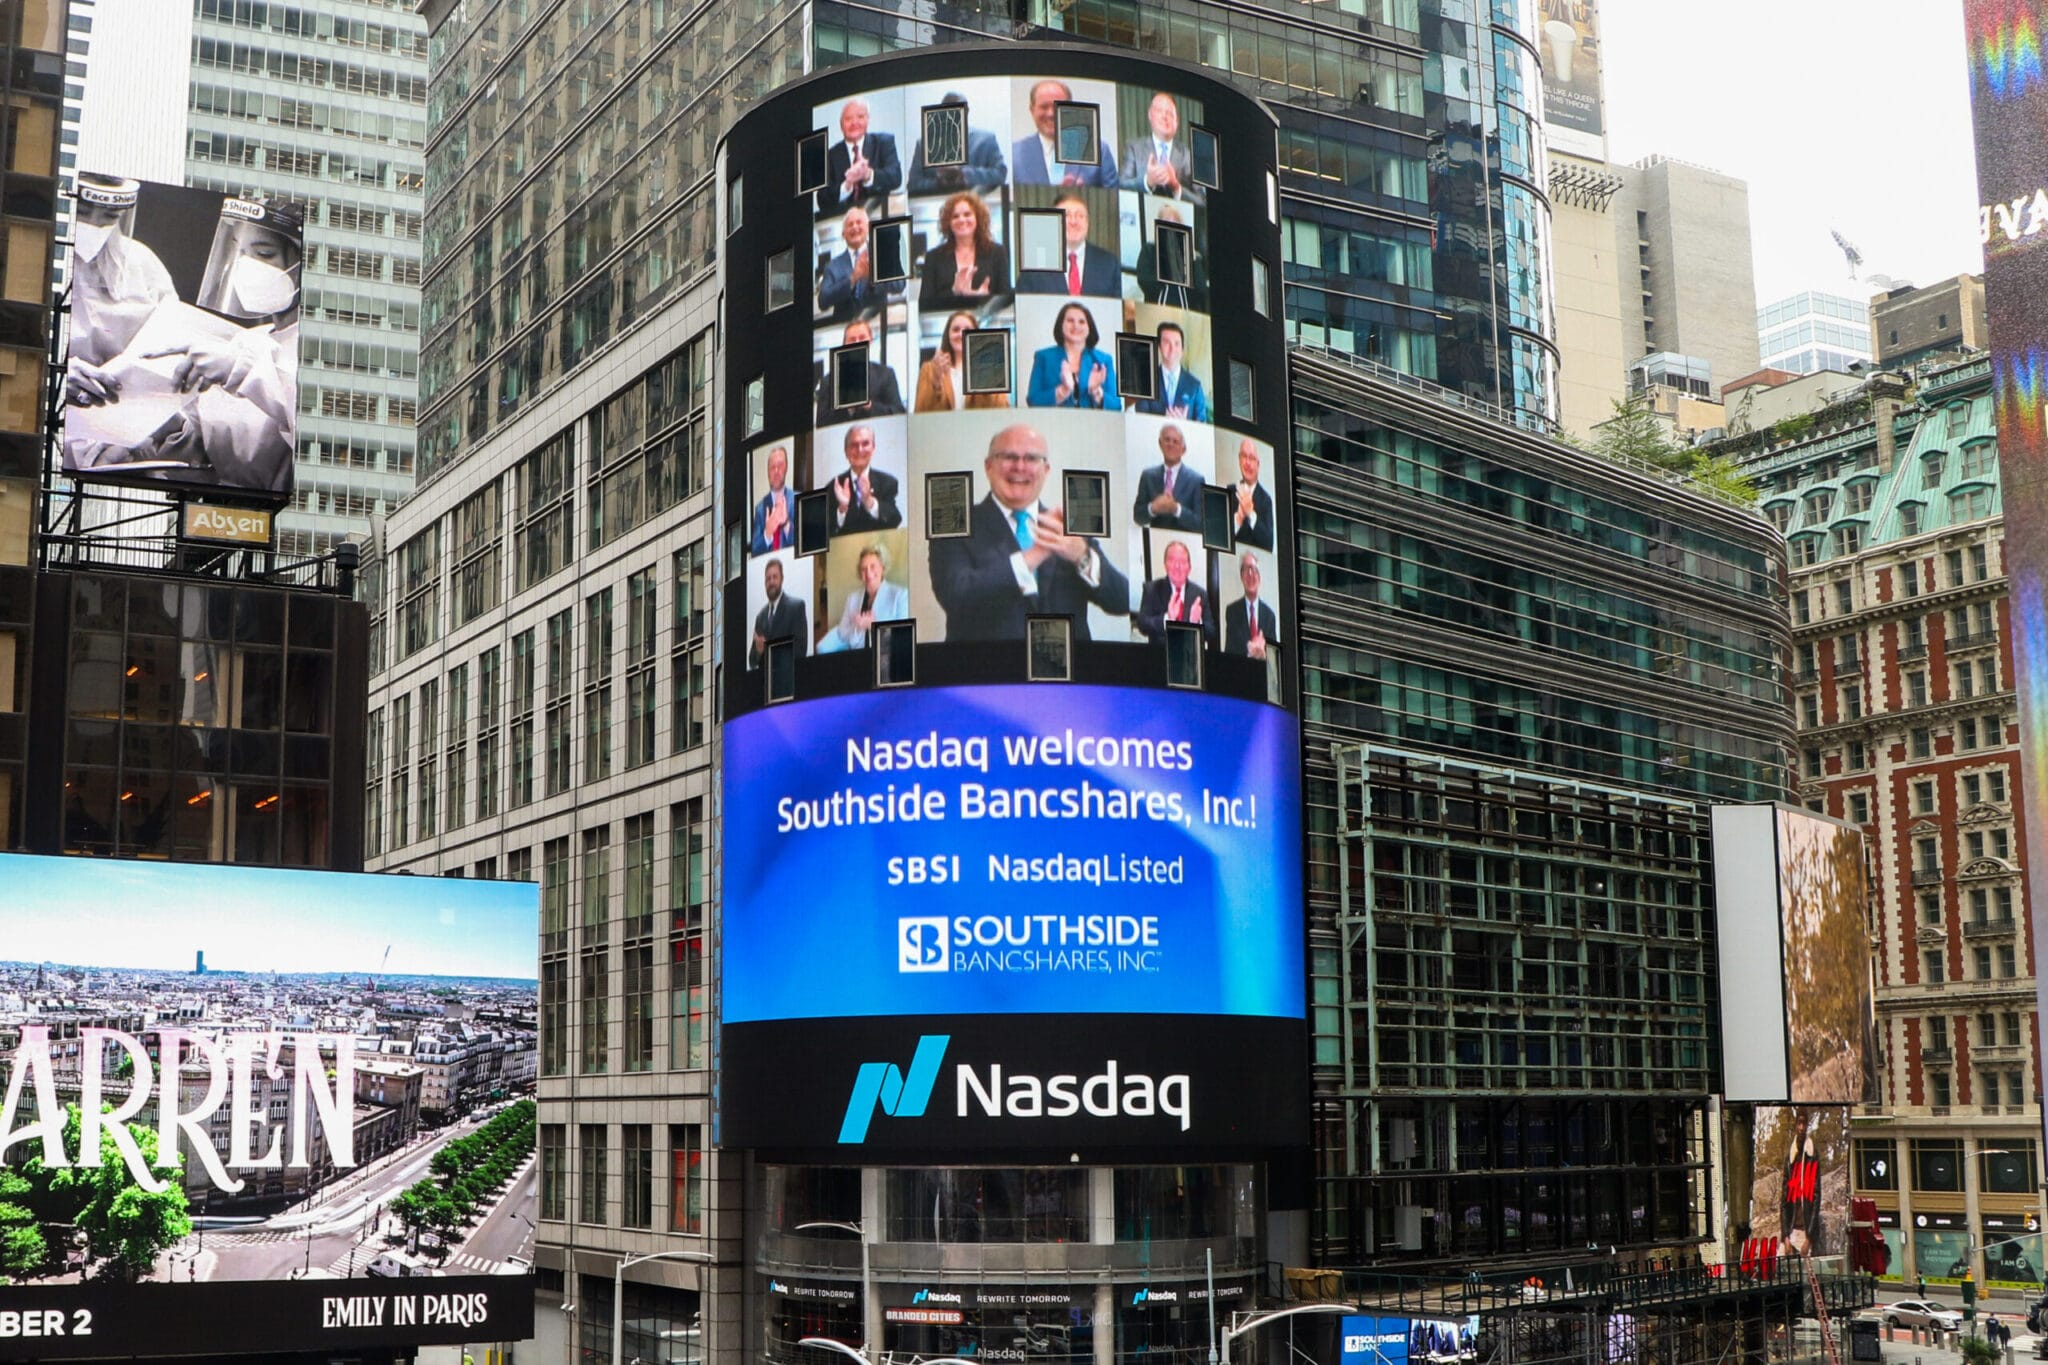 Southside Bancshares rings NASDAQ bell